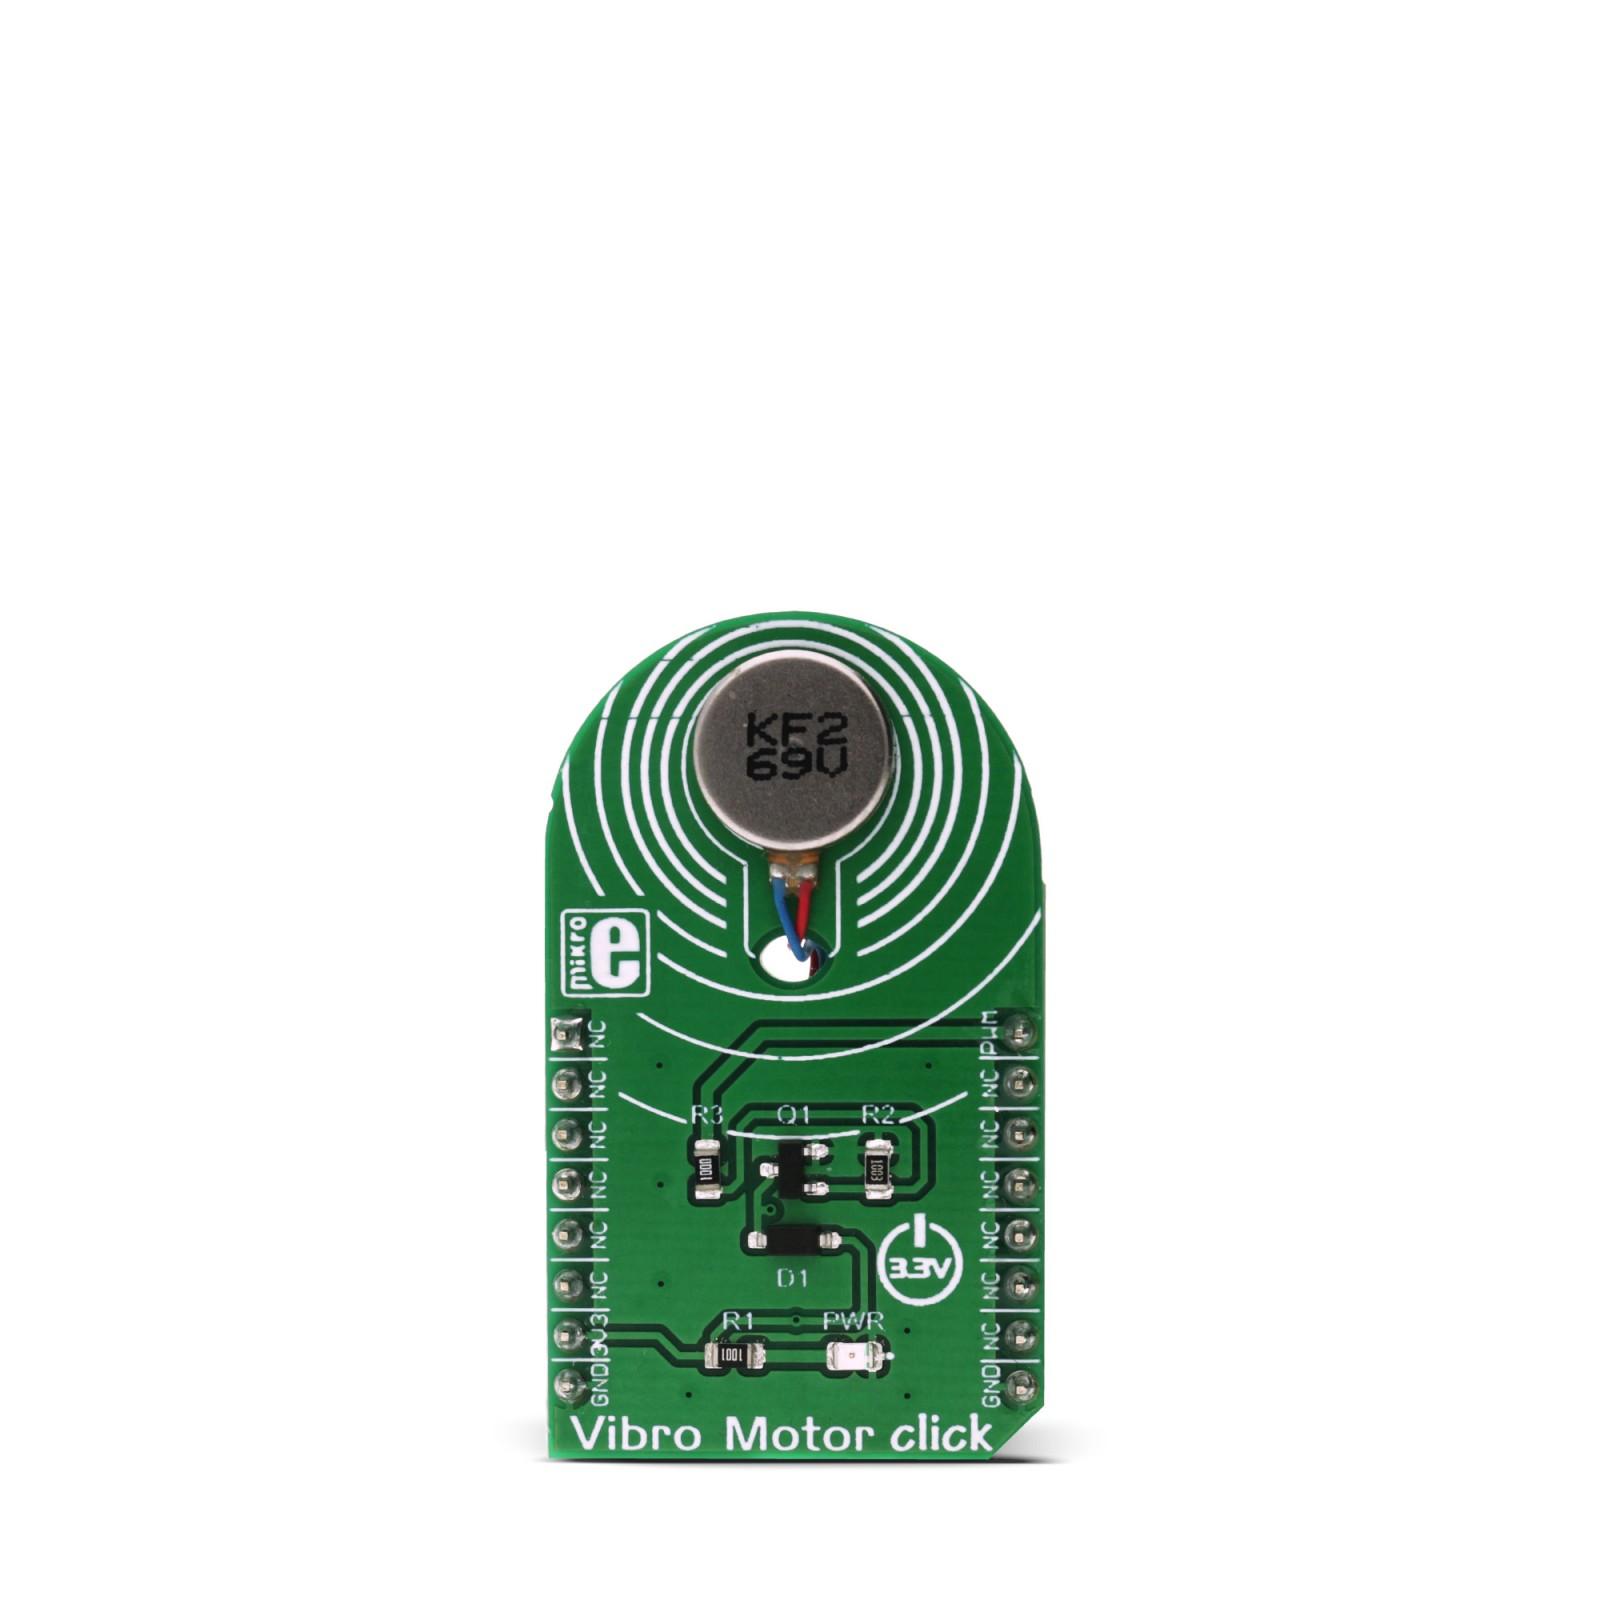 Vibro Motor click | MikroElektronika